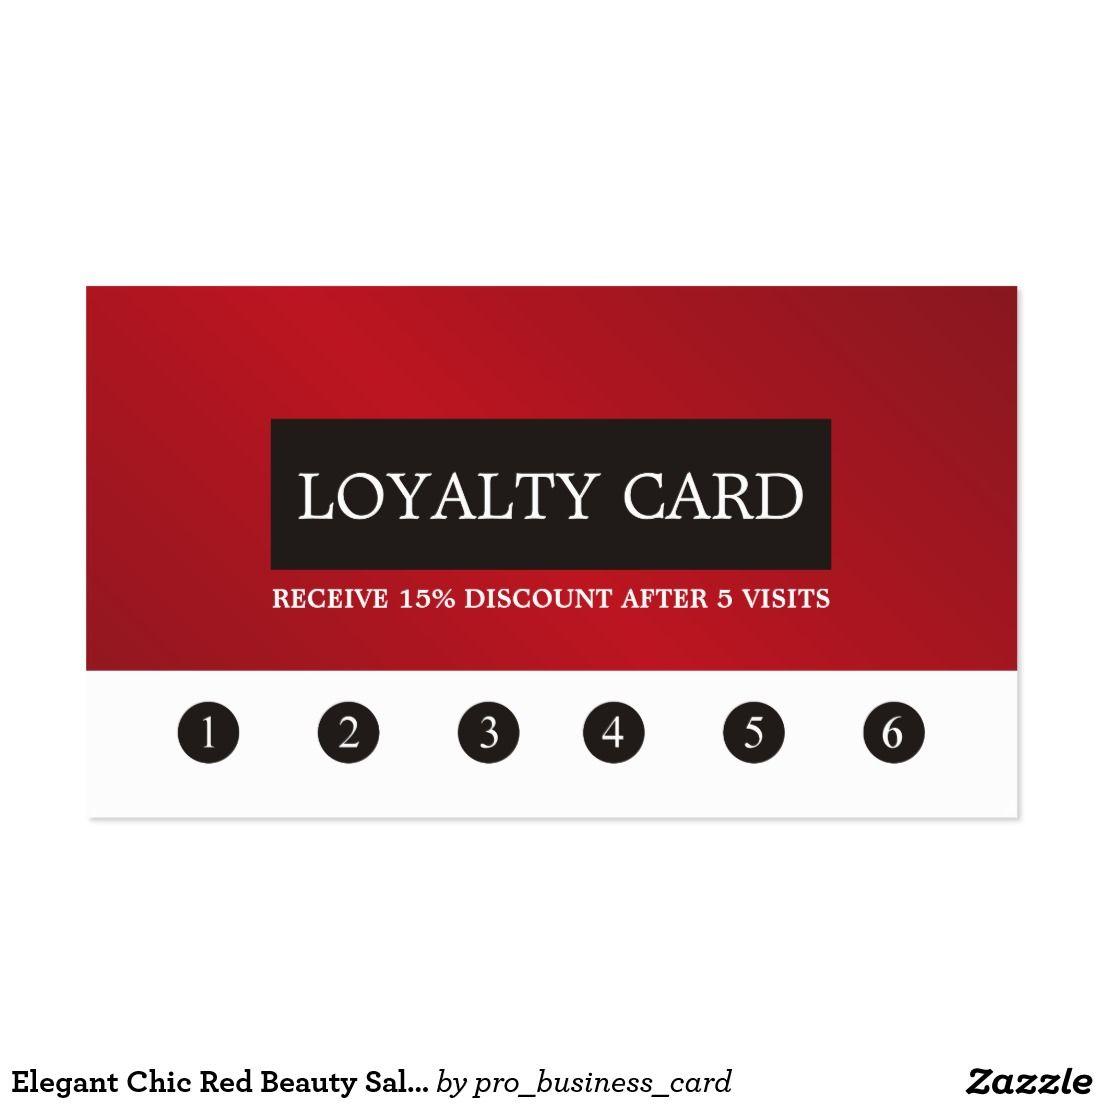 Elegant Chic Red Beauty Salon Loyalty Card | Loyalty Cards Design ...